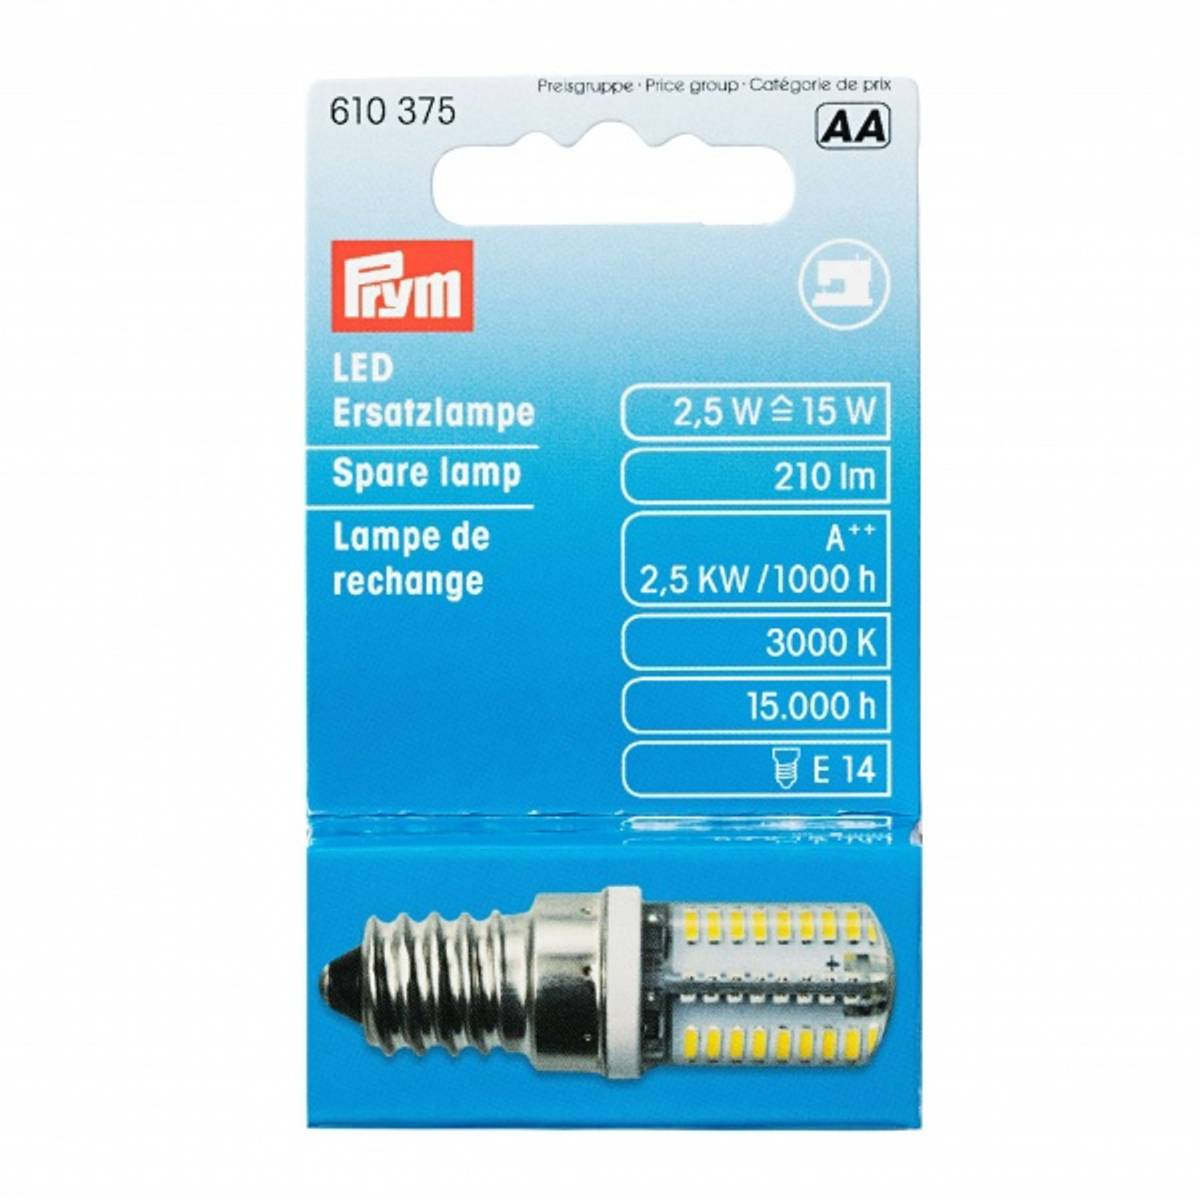 Prym lyspære til symaskin - LED skru 610375